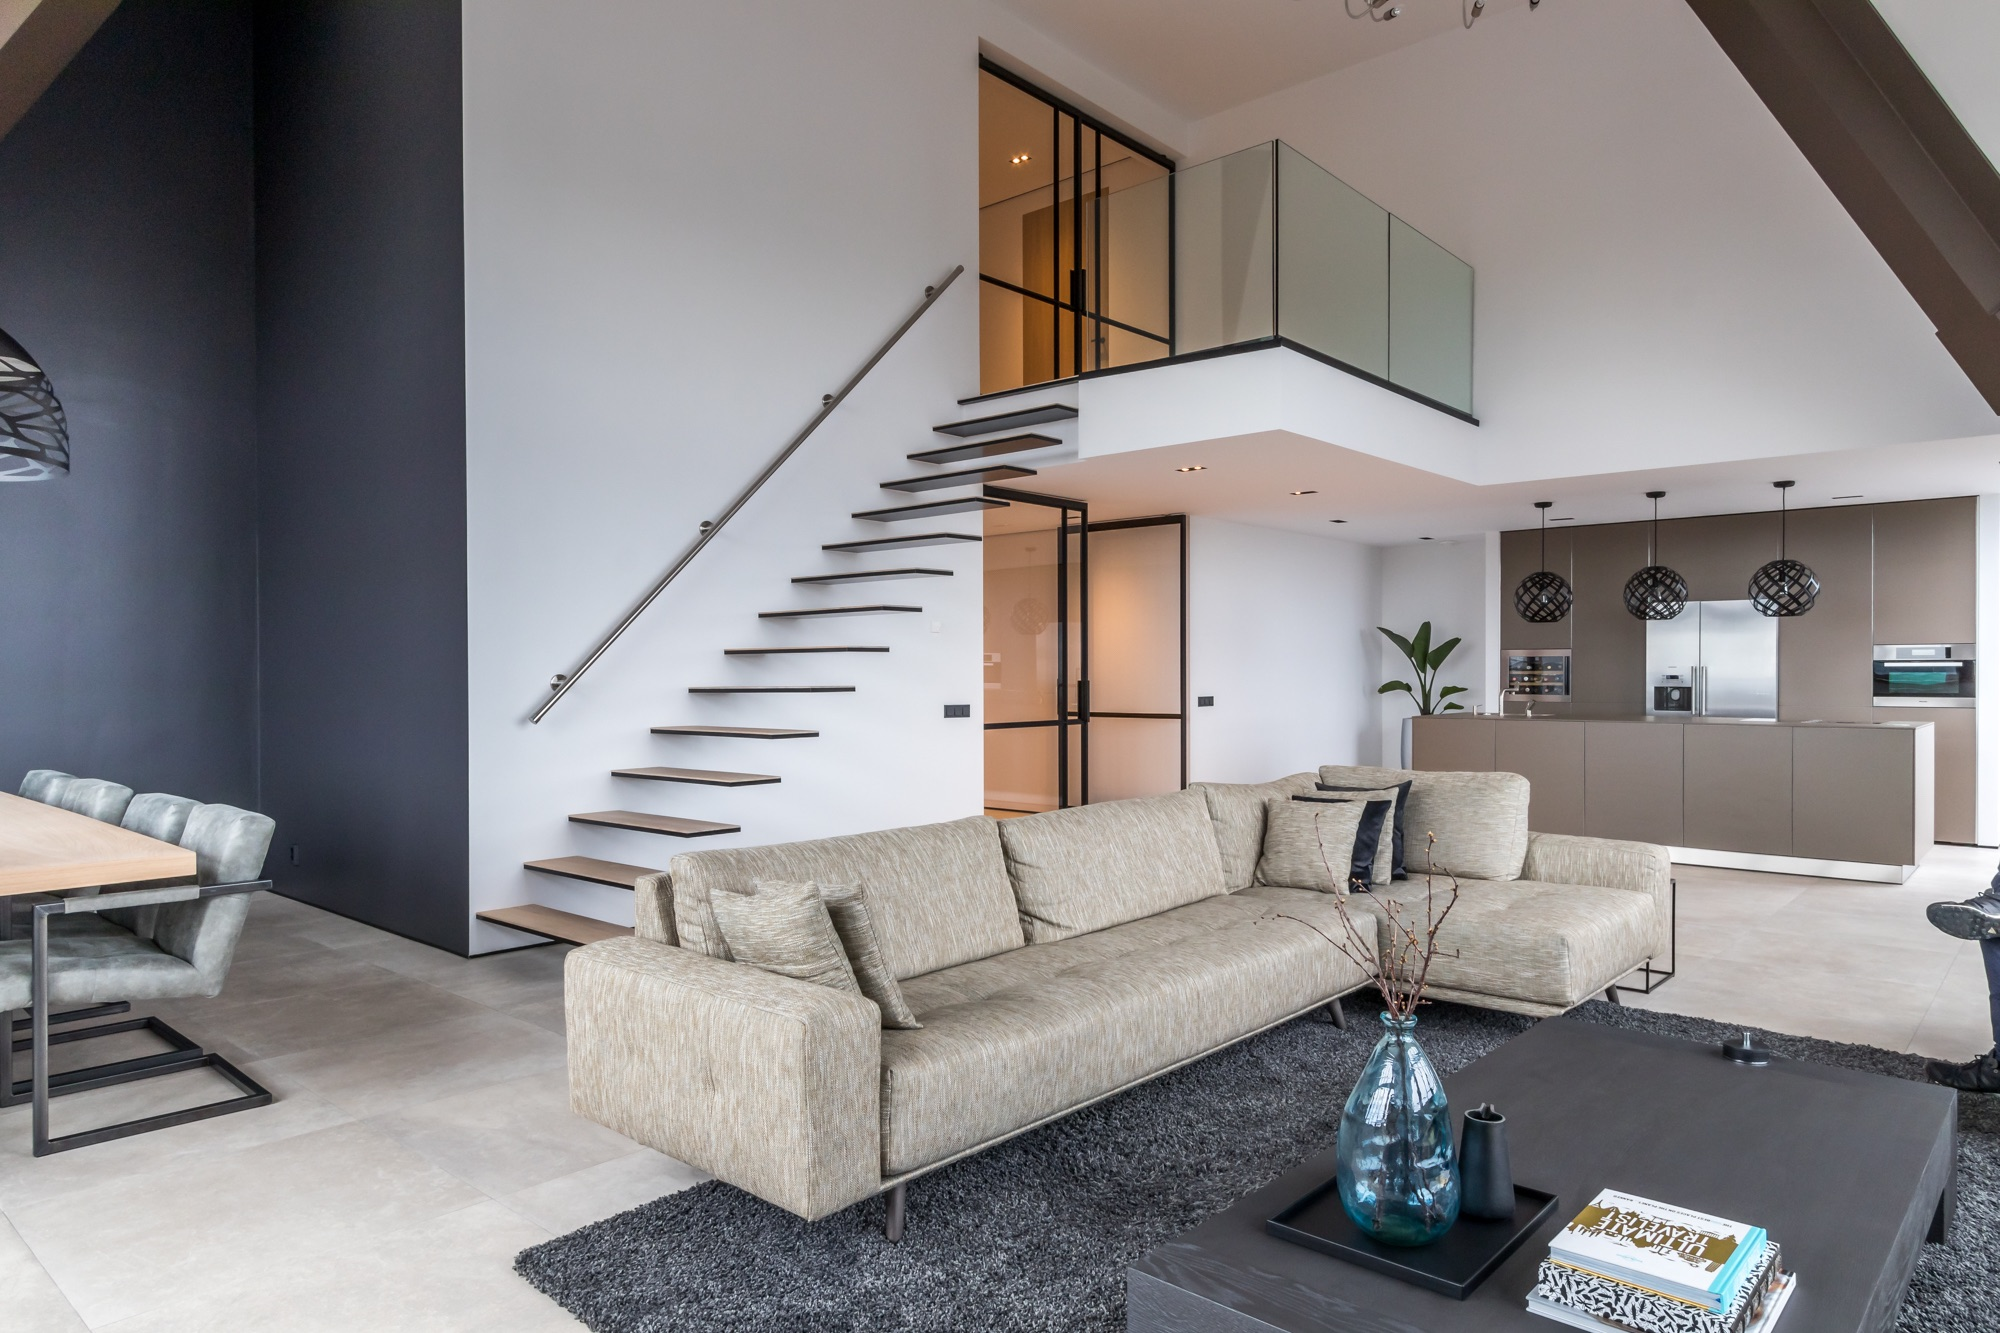 Modern interieur met zwevende stalen trap en glazen balustrade